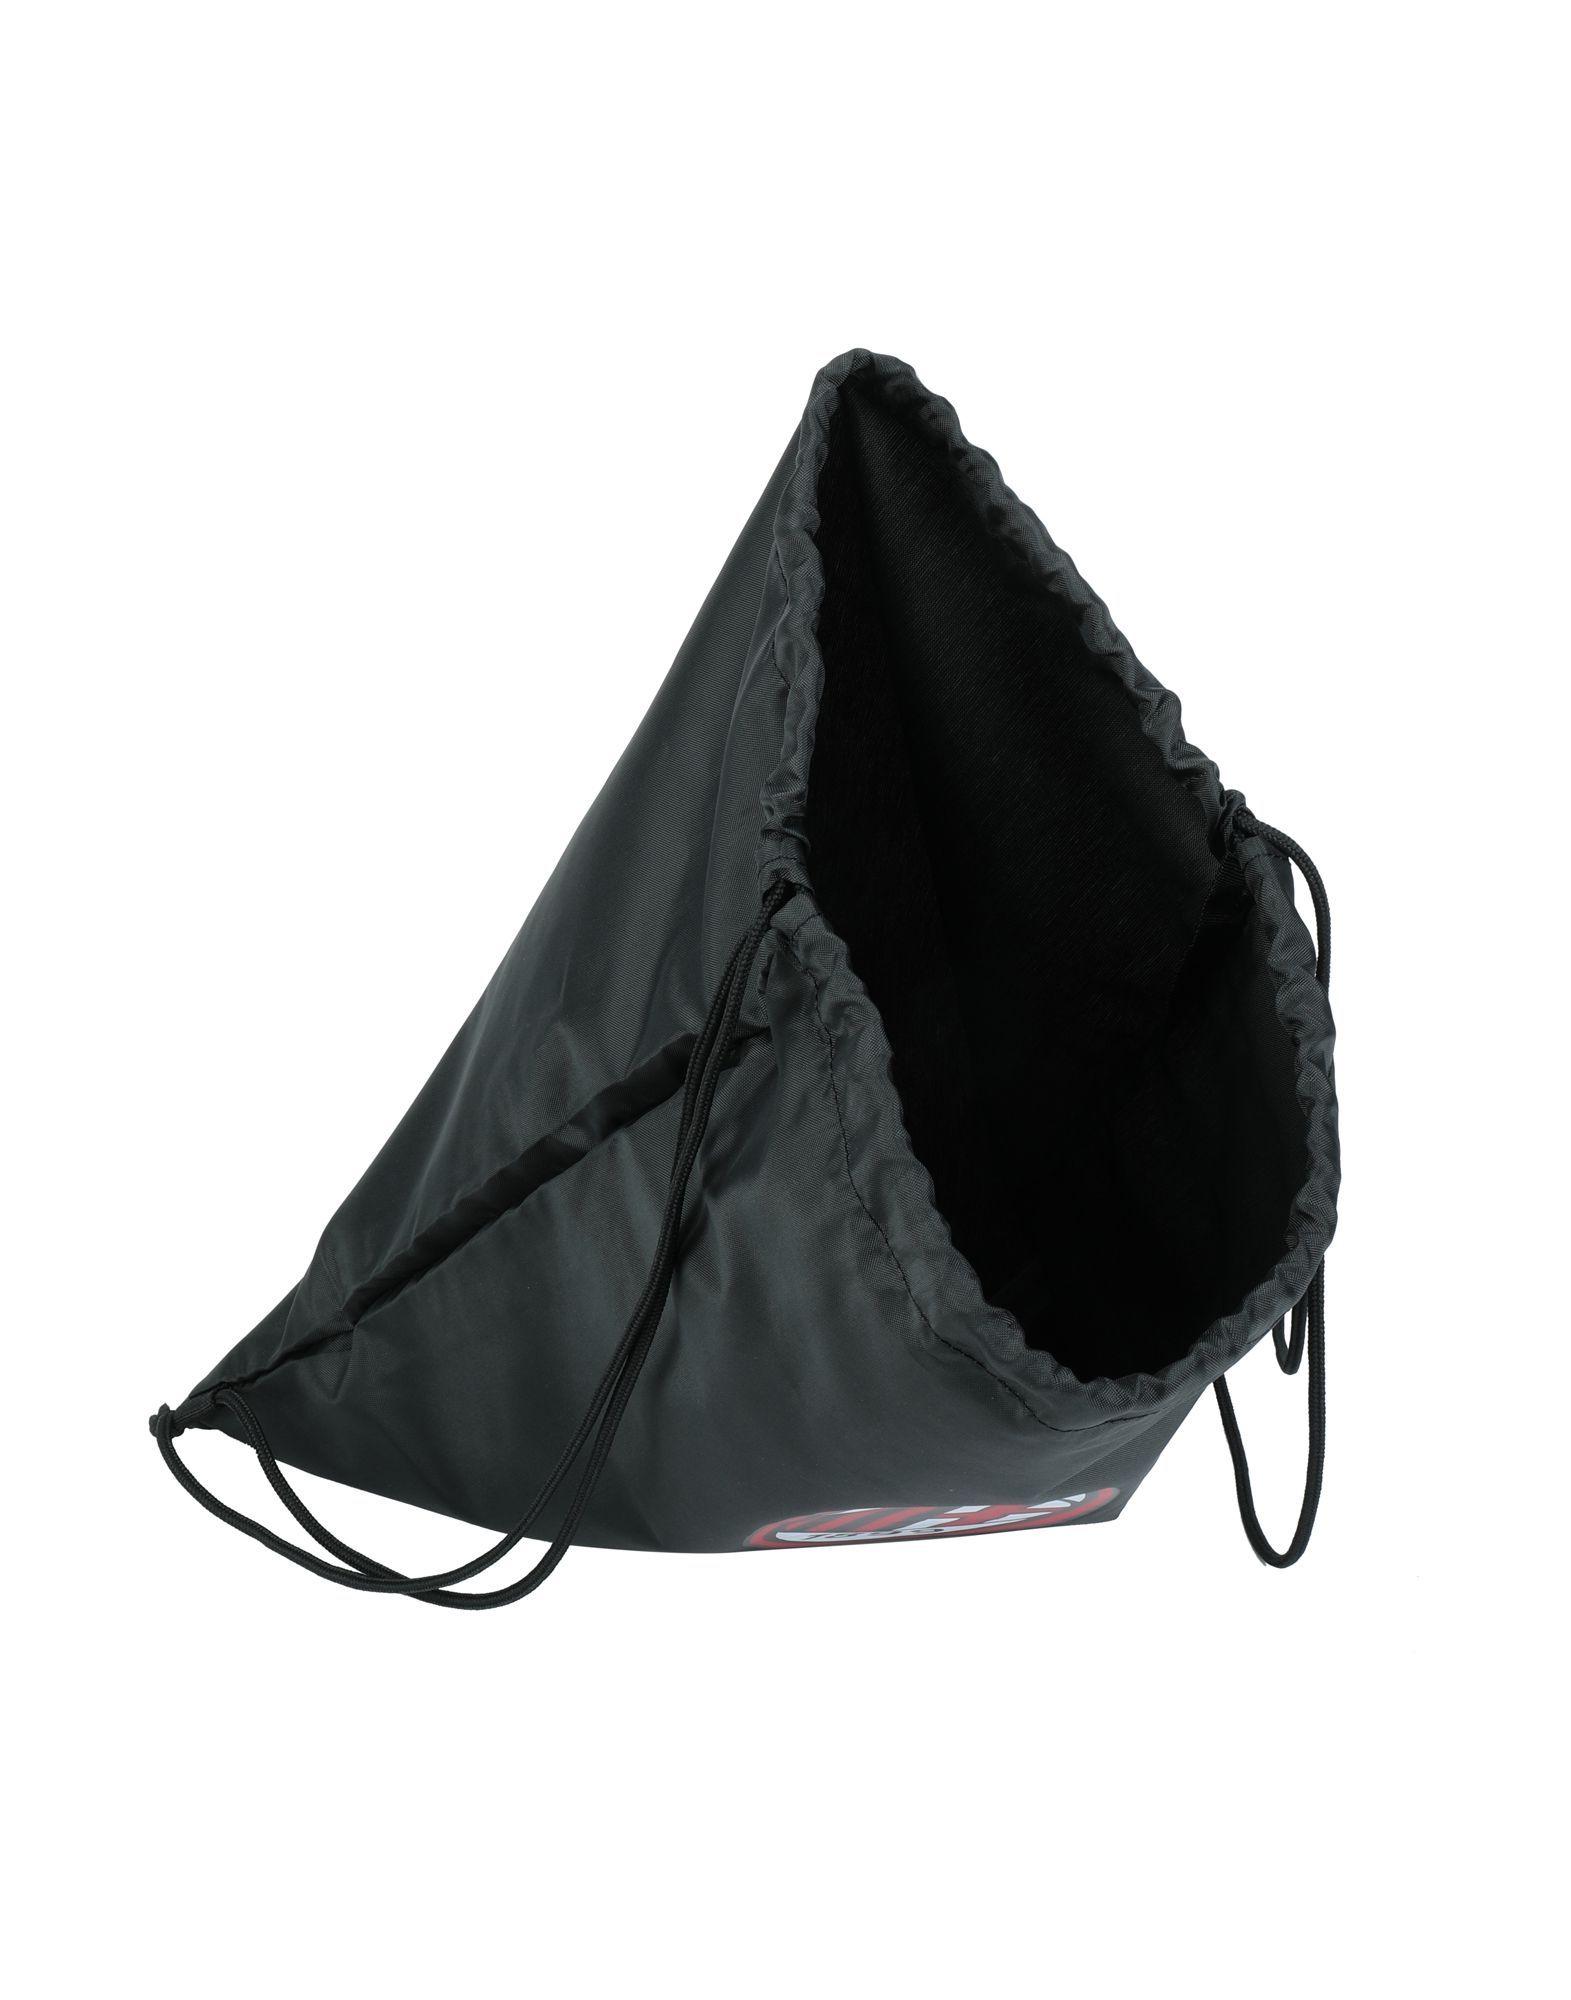 BAGS Unisex Puma Black Polyester